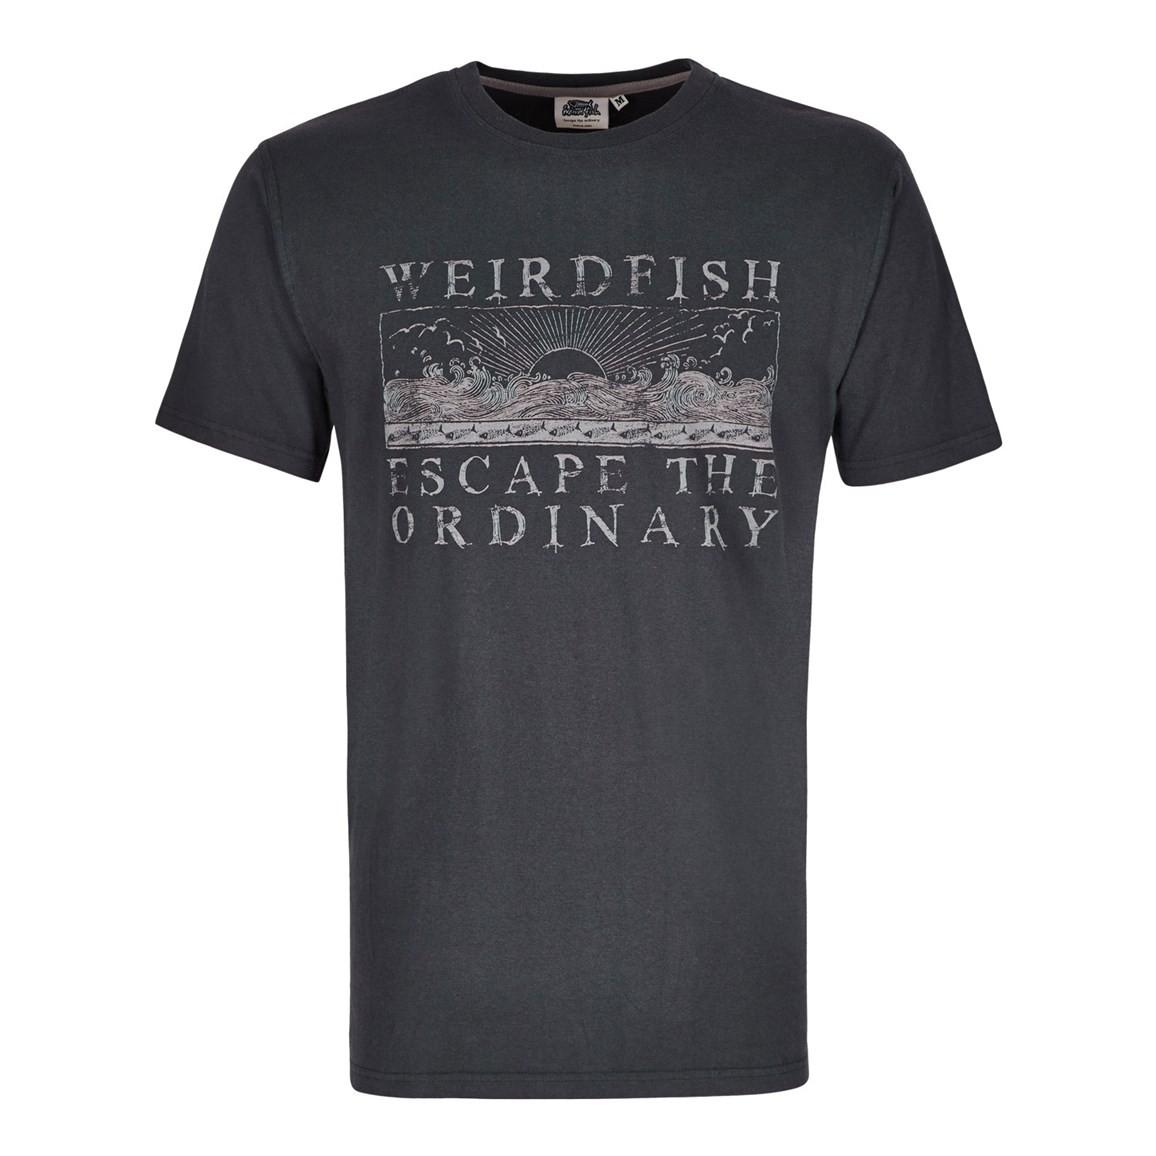 Weird Fish Raziel Branded Graphic Print T-Shirt Ebony Size 2XL